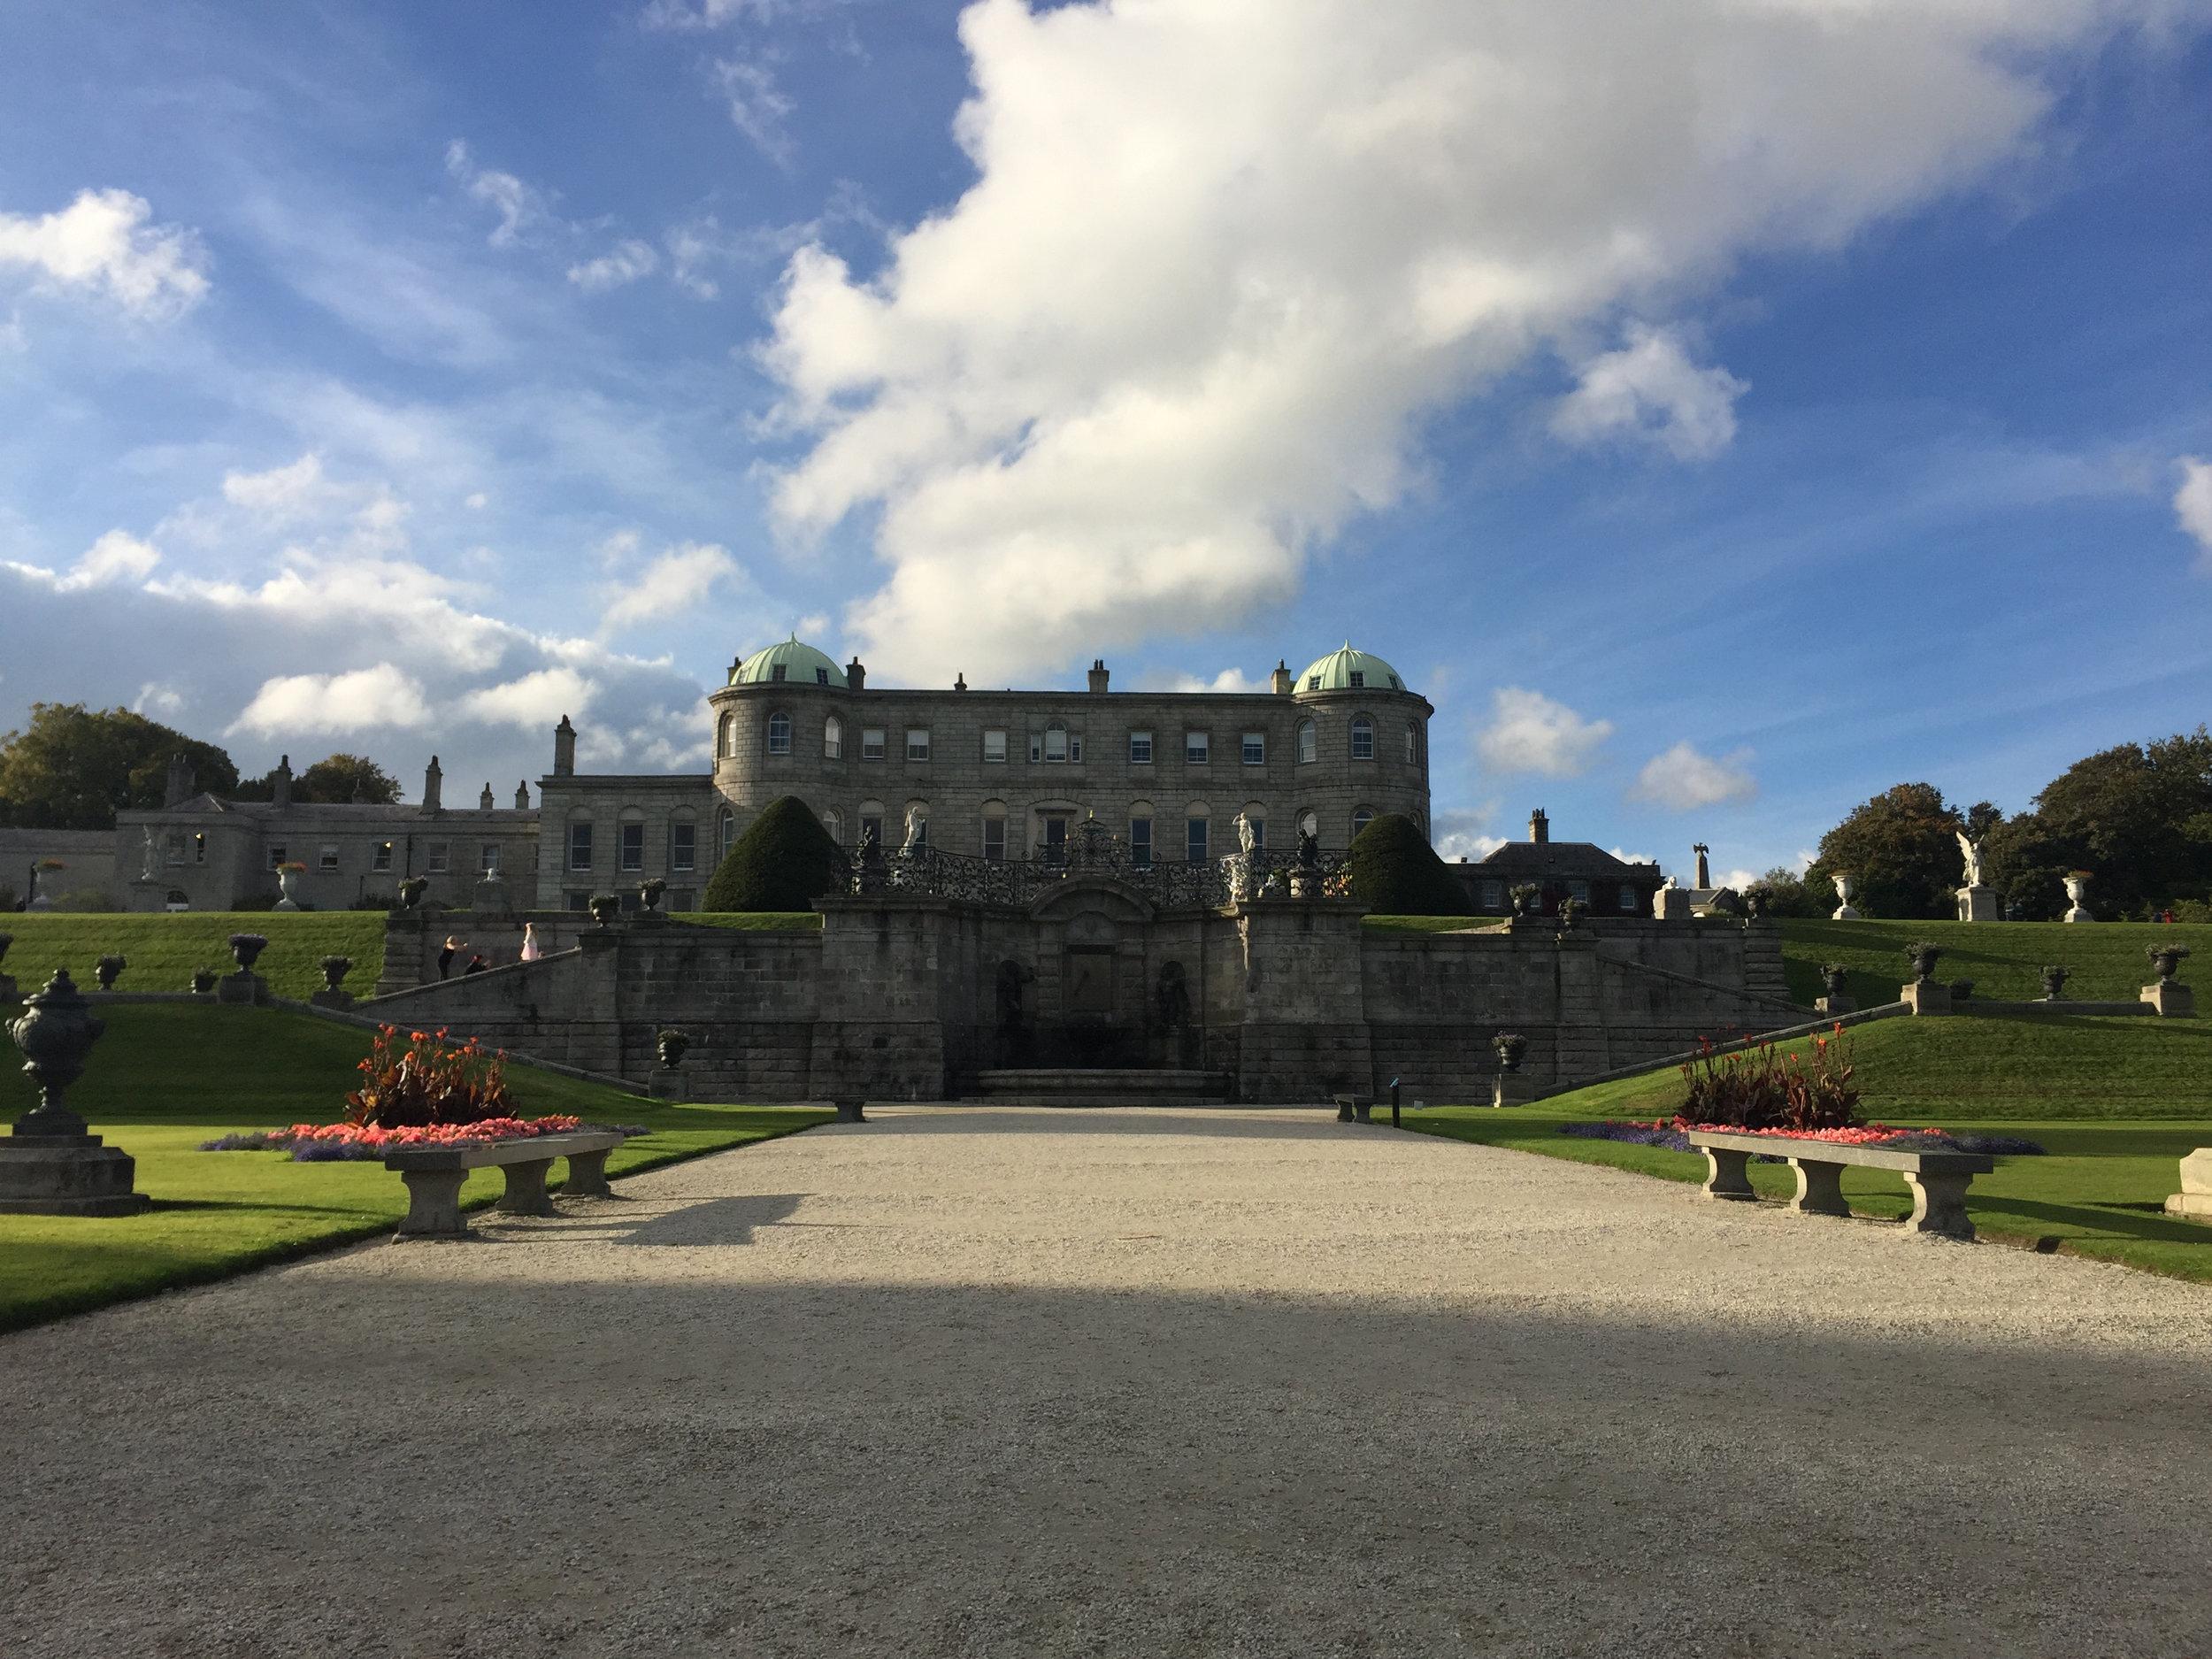 Powerscourt House and gardens.